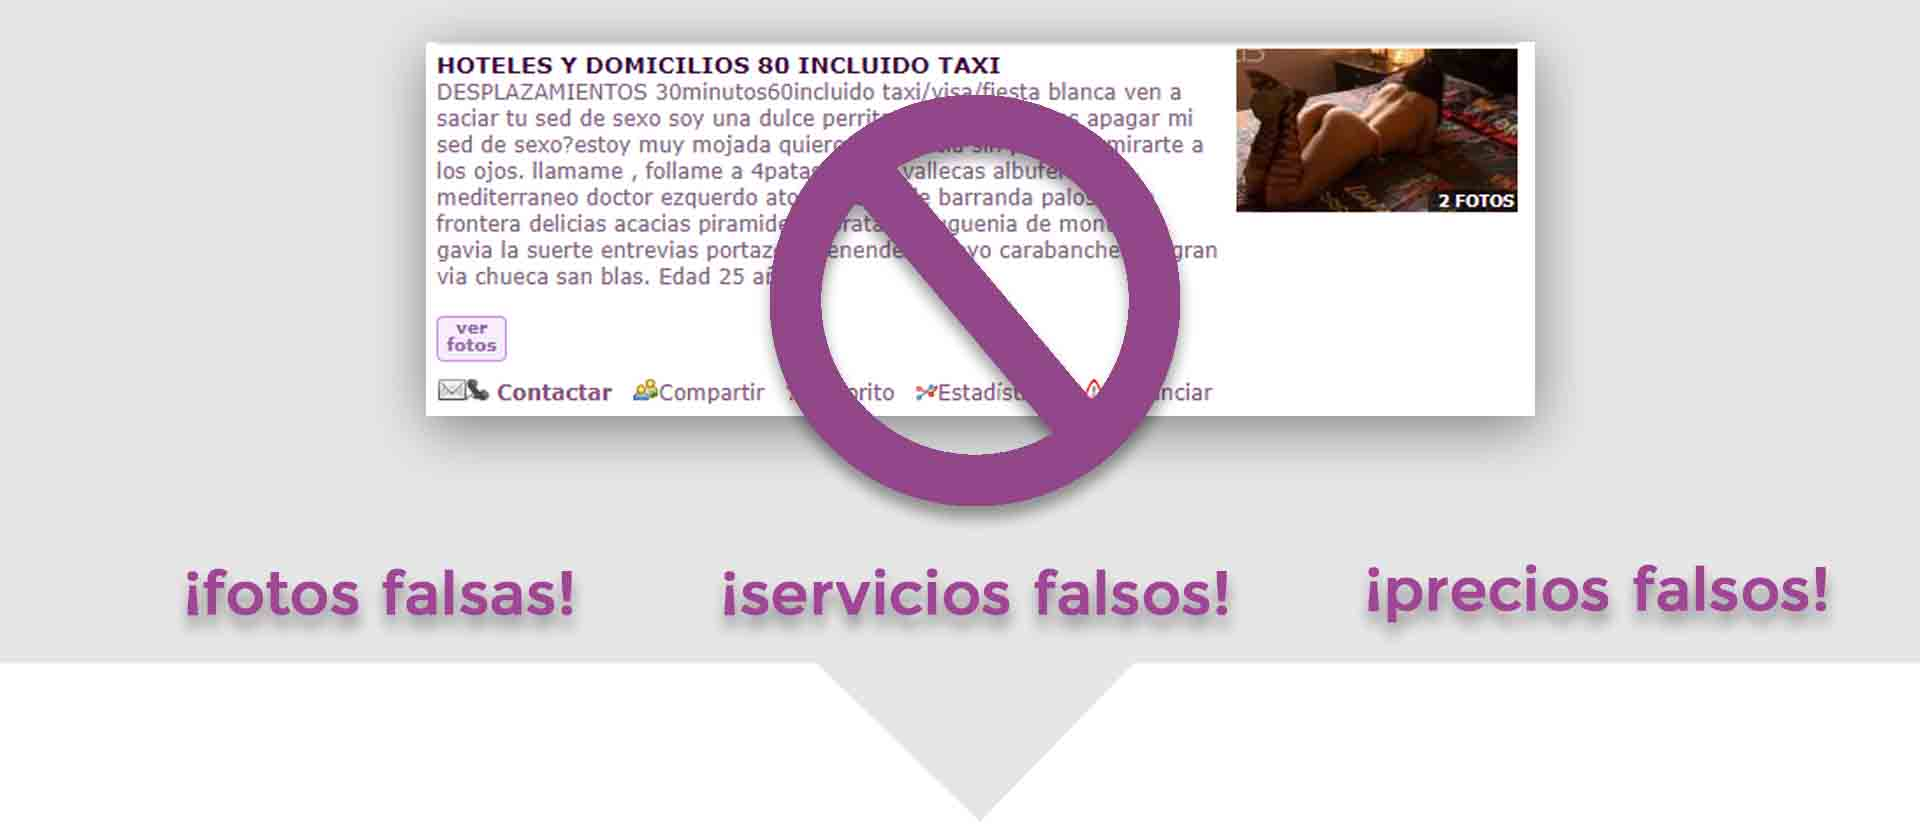 anuncio falso putas en Valencia